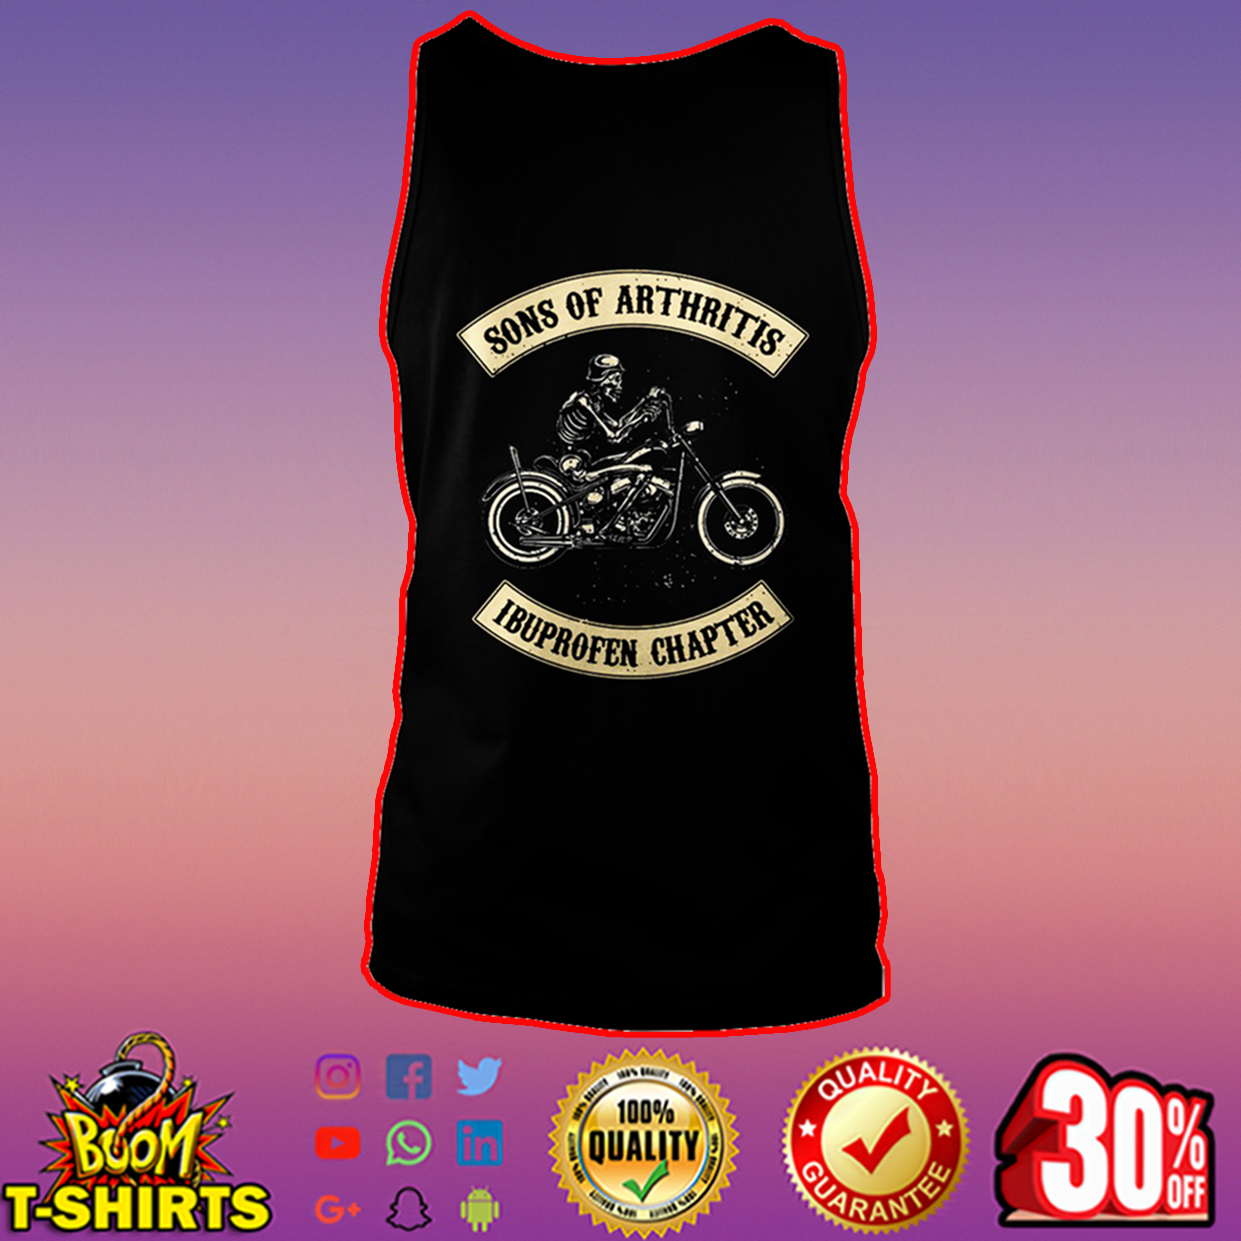 Sons of arthritis ibuprofen chapter tank top